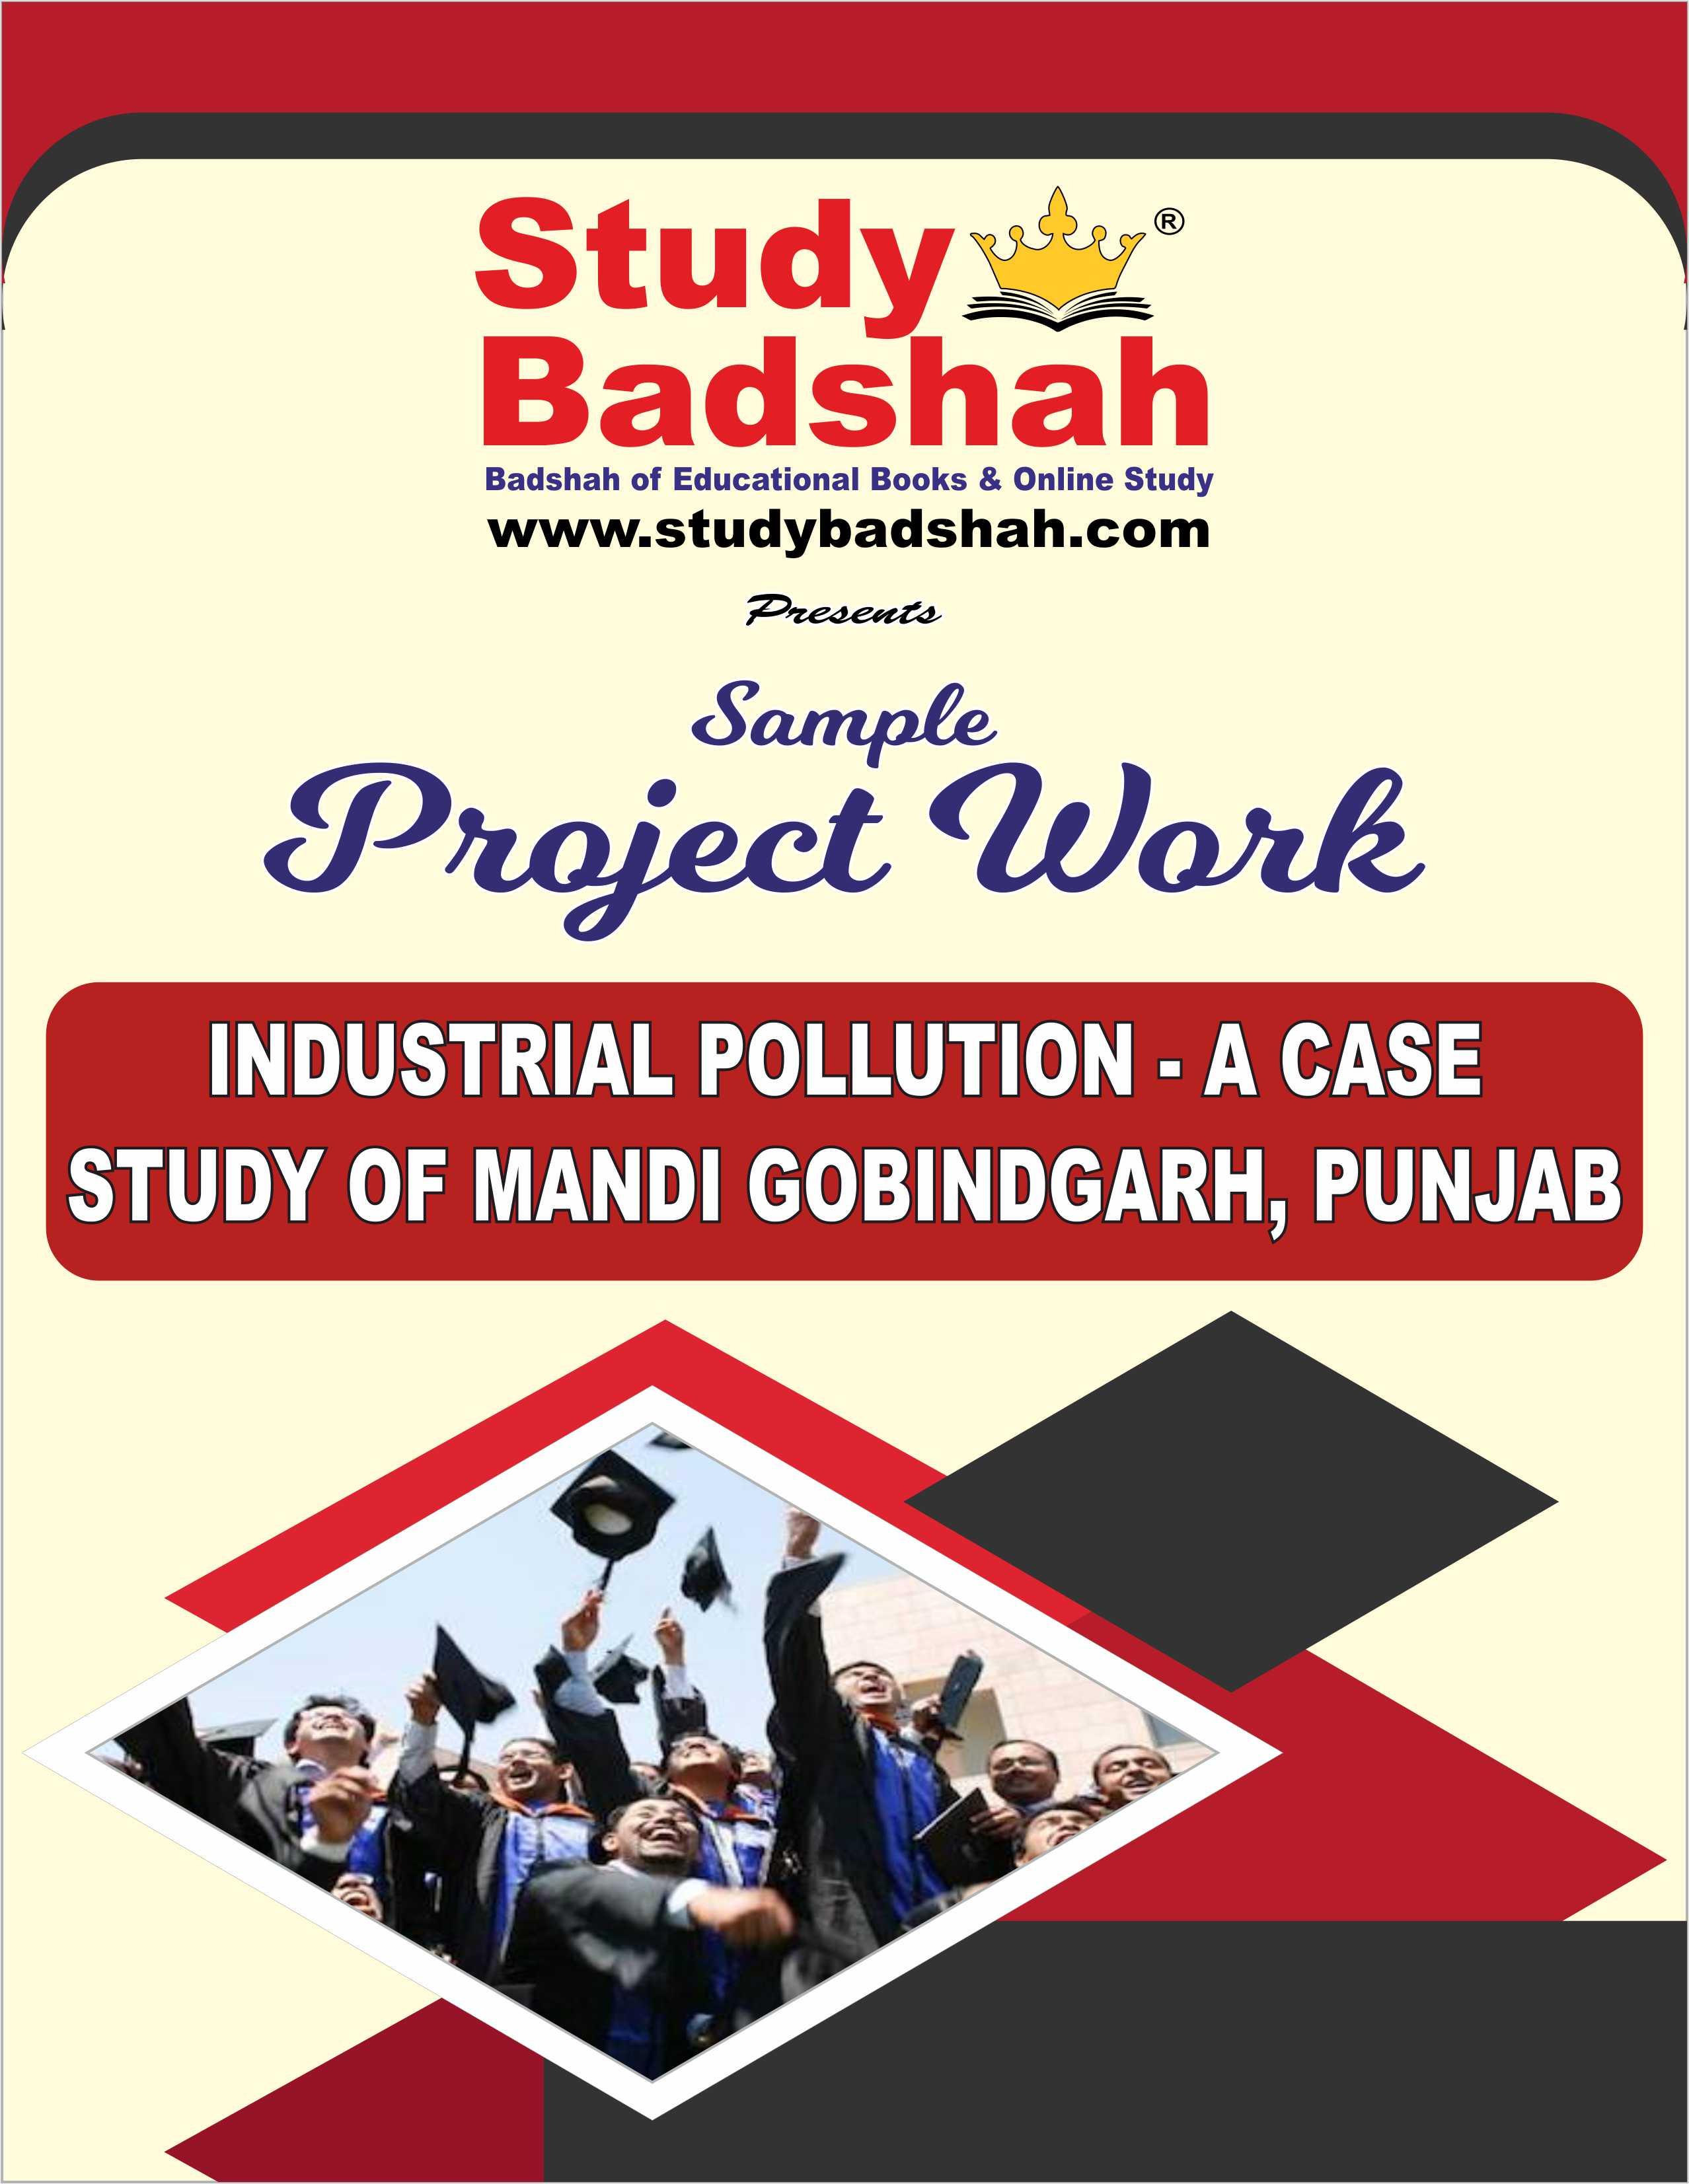 INDUSTRIAL POLLUTION - A CASE STUDY OF MANDI GOBINDGARH, PUNJAB